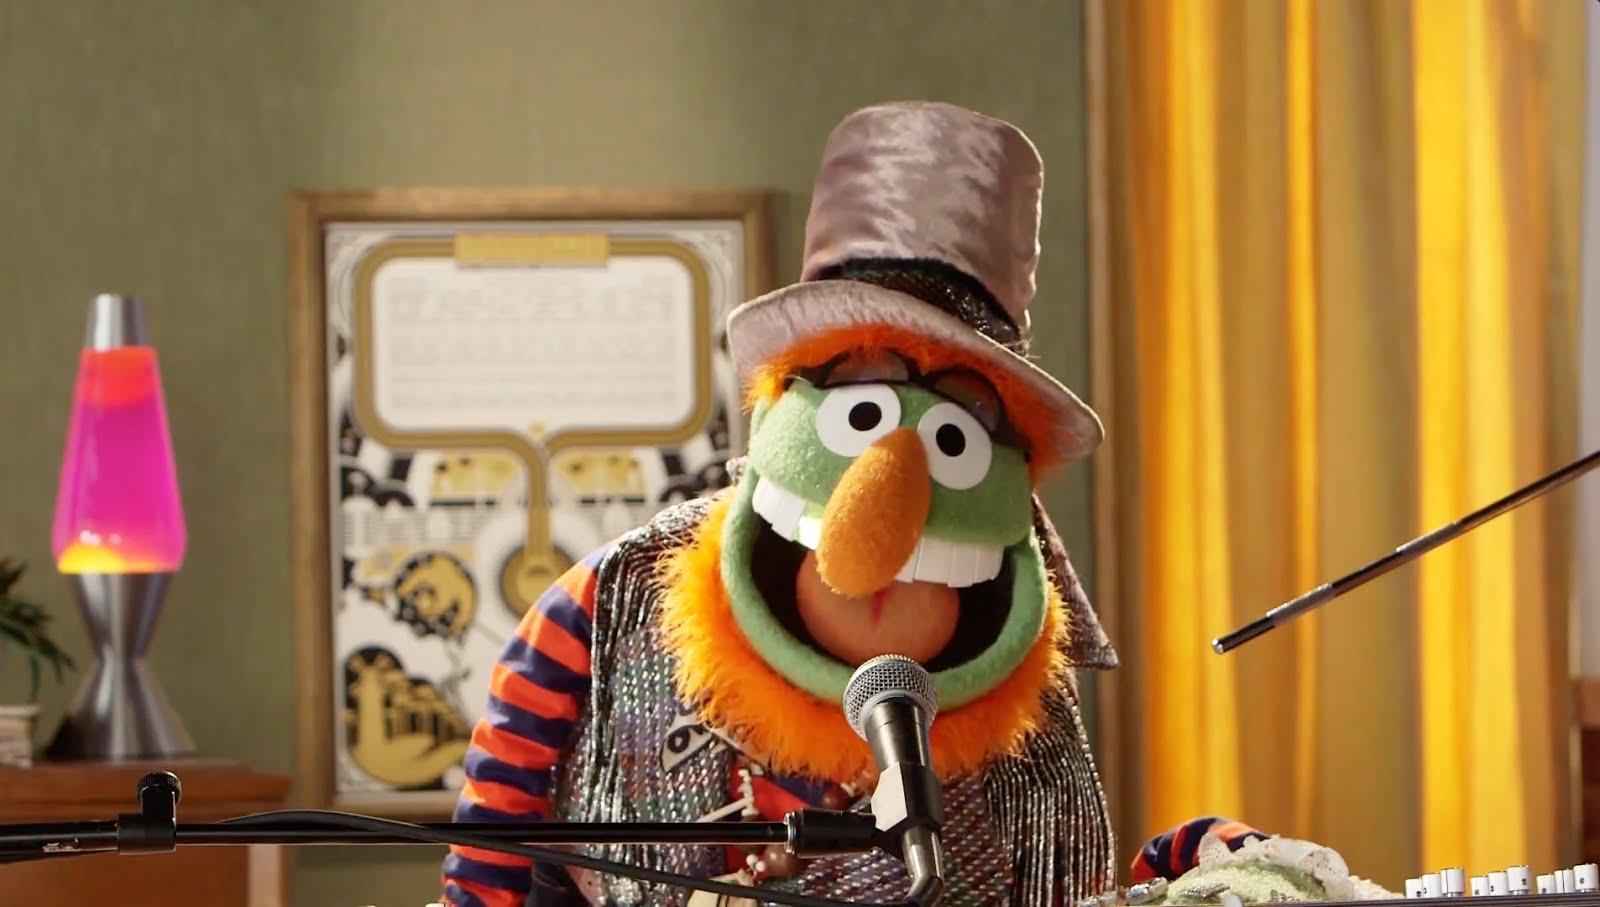 muppet stuff electric mayhem to perform live